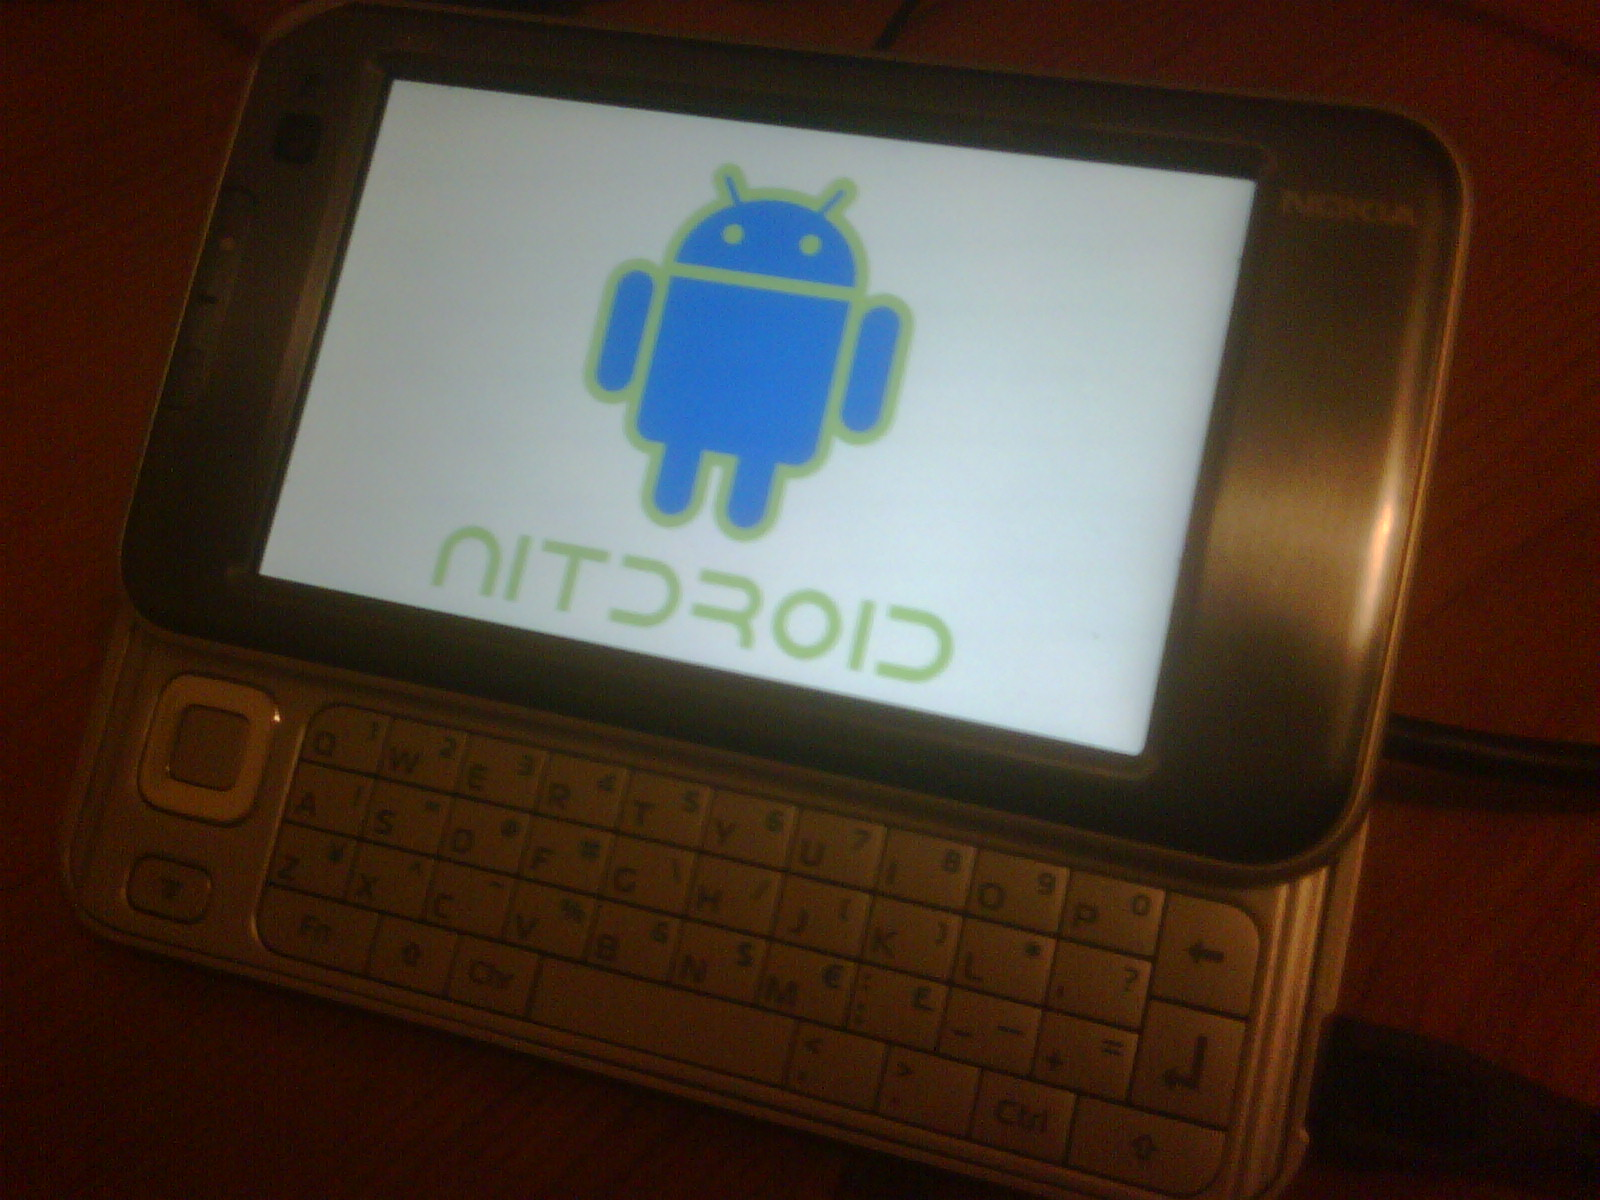 Nokia c6 themes free download mobile9.